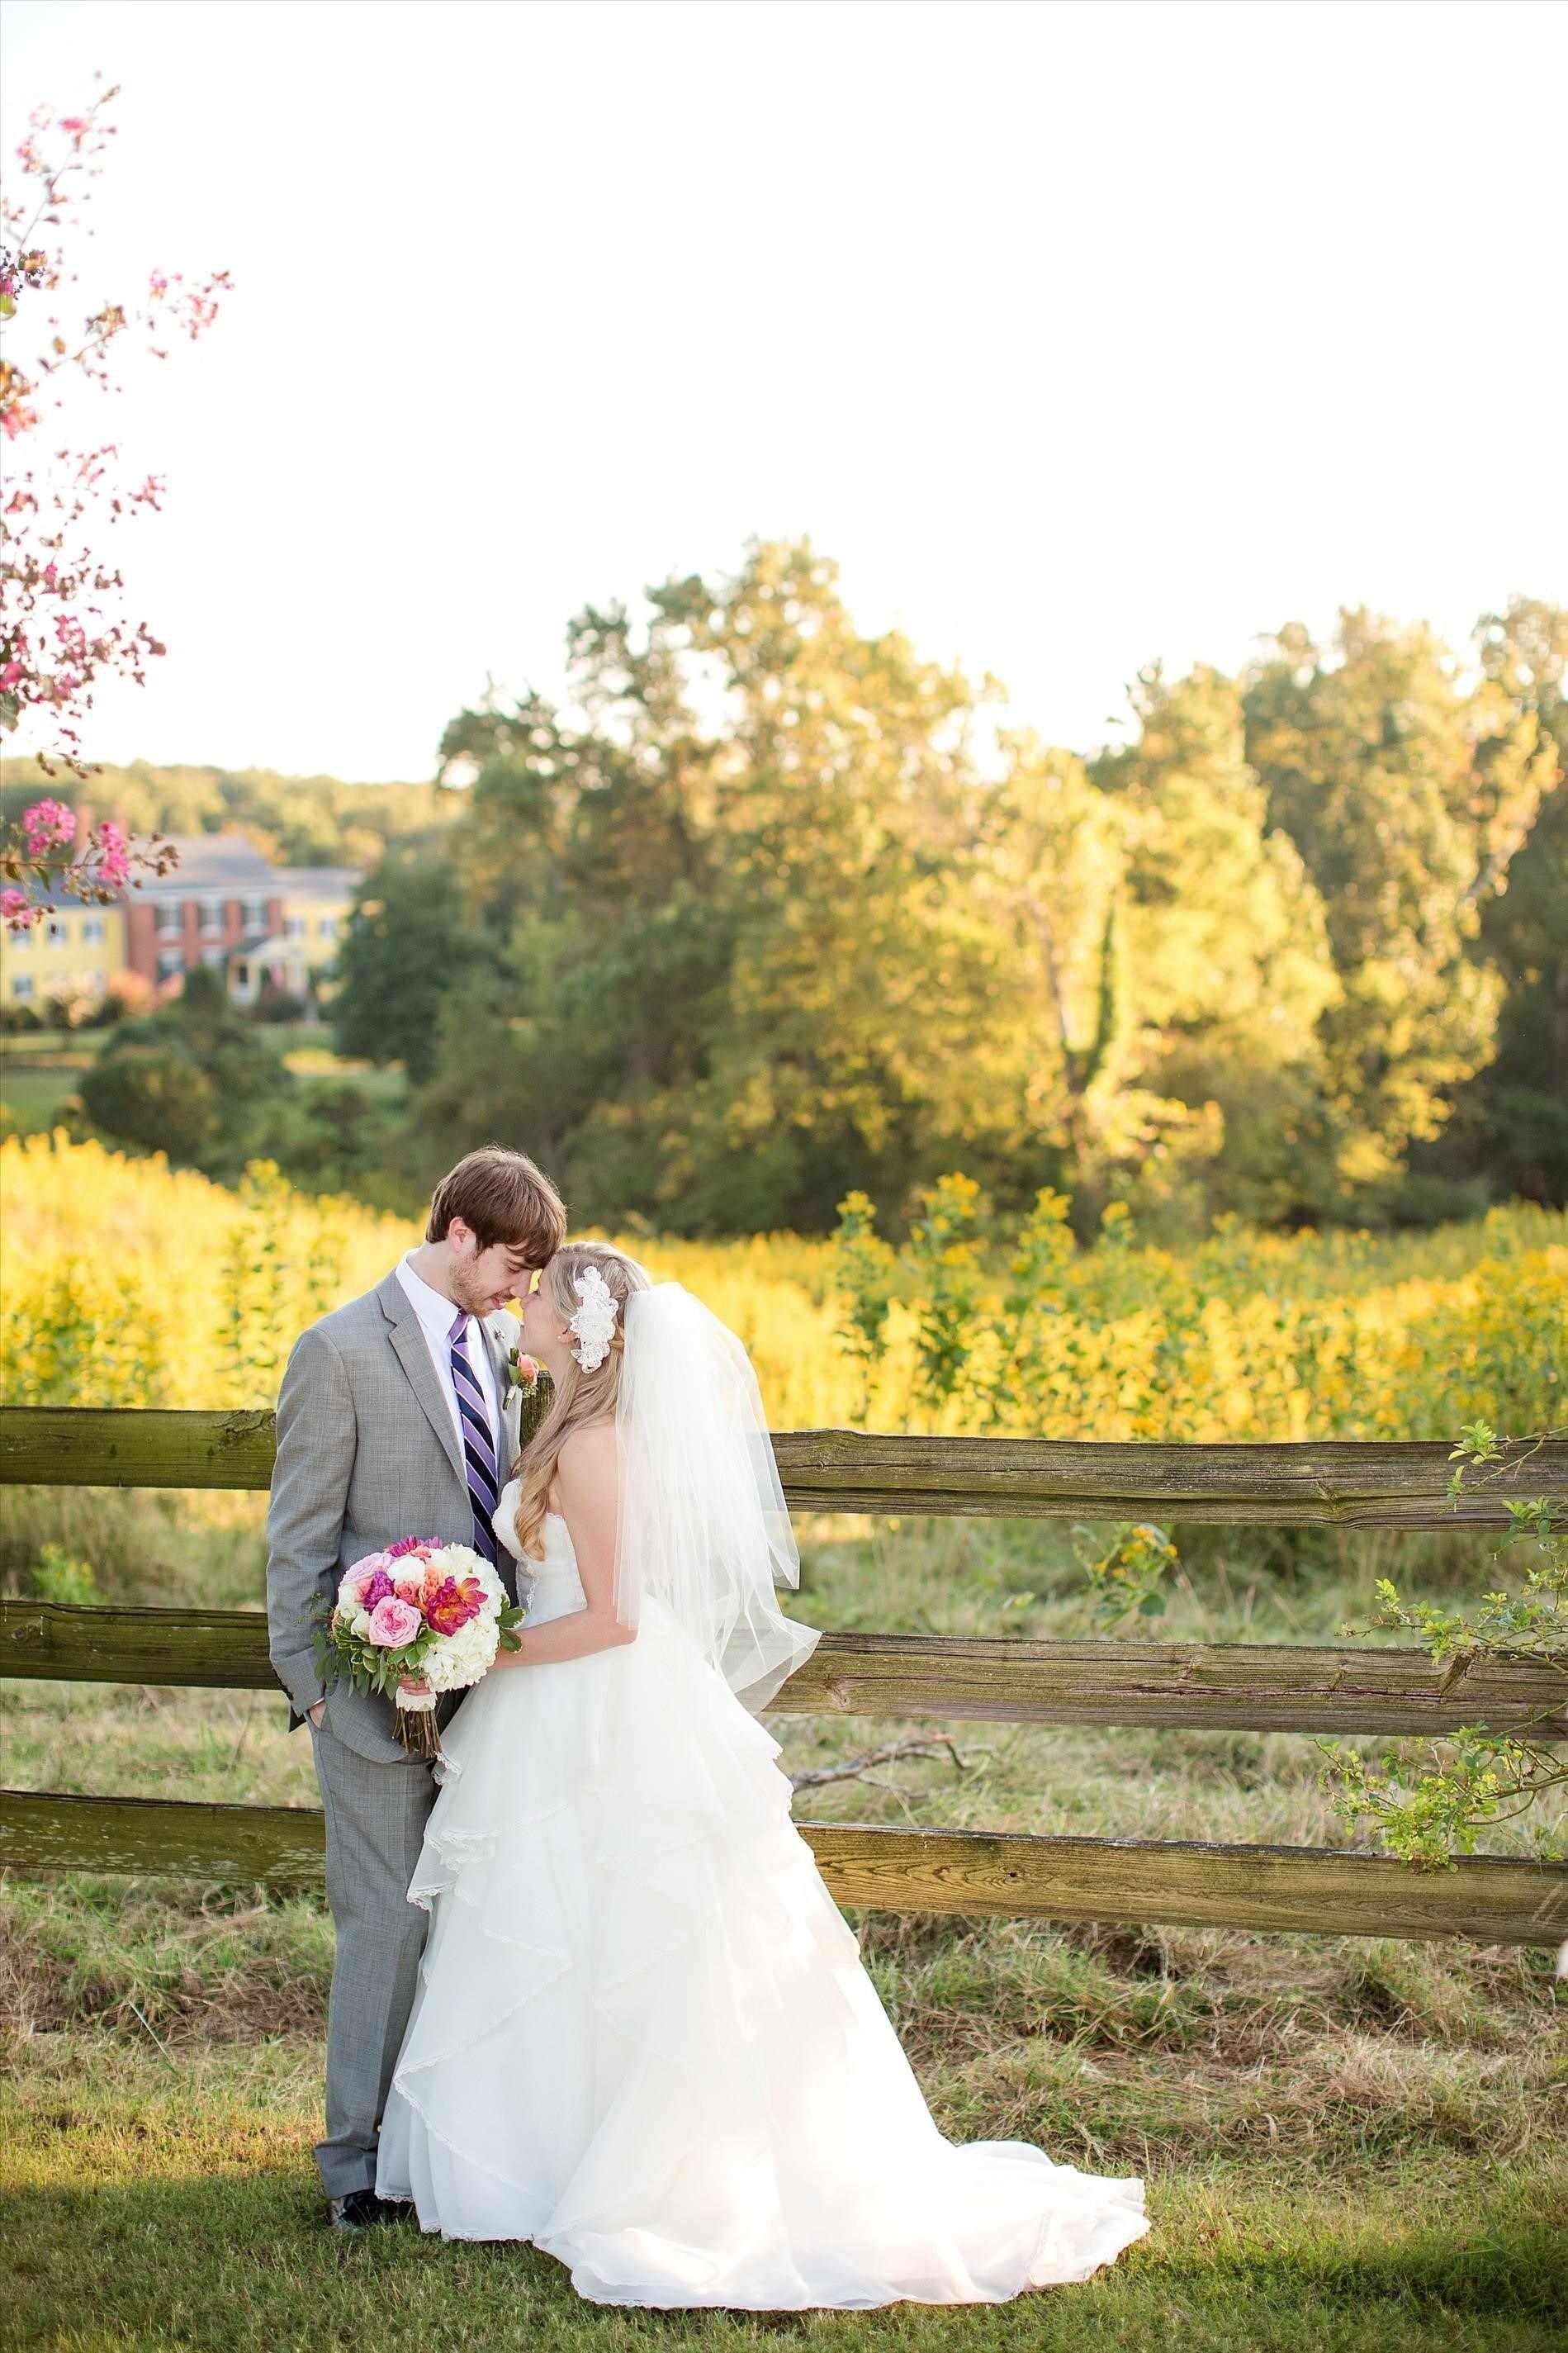 10 Fabulous Wedding Photo Ideas Bride And Groom on country pinterest bride groom pin country wedding photo ideas 2020